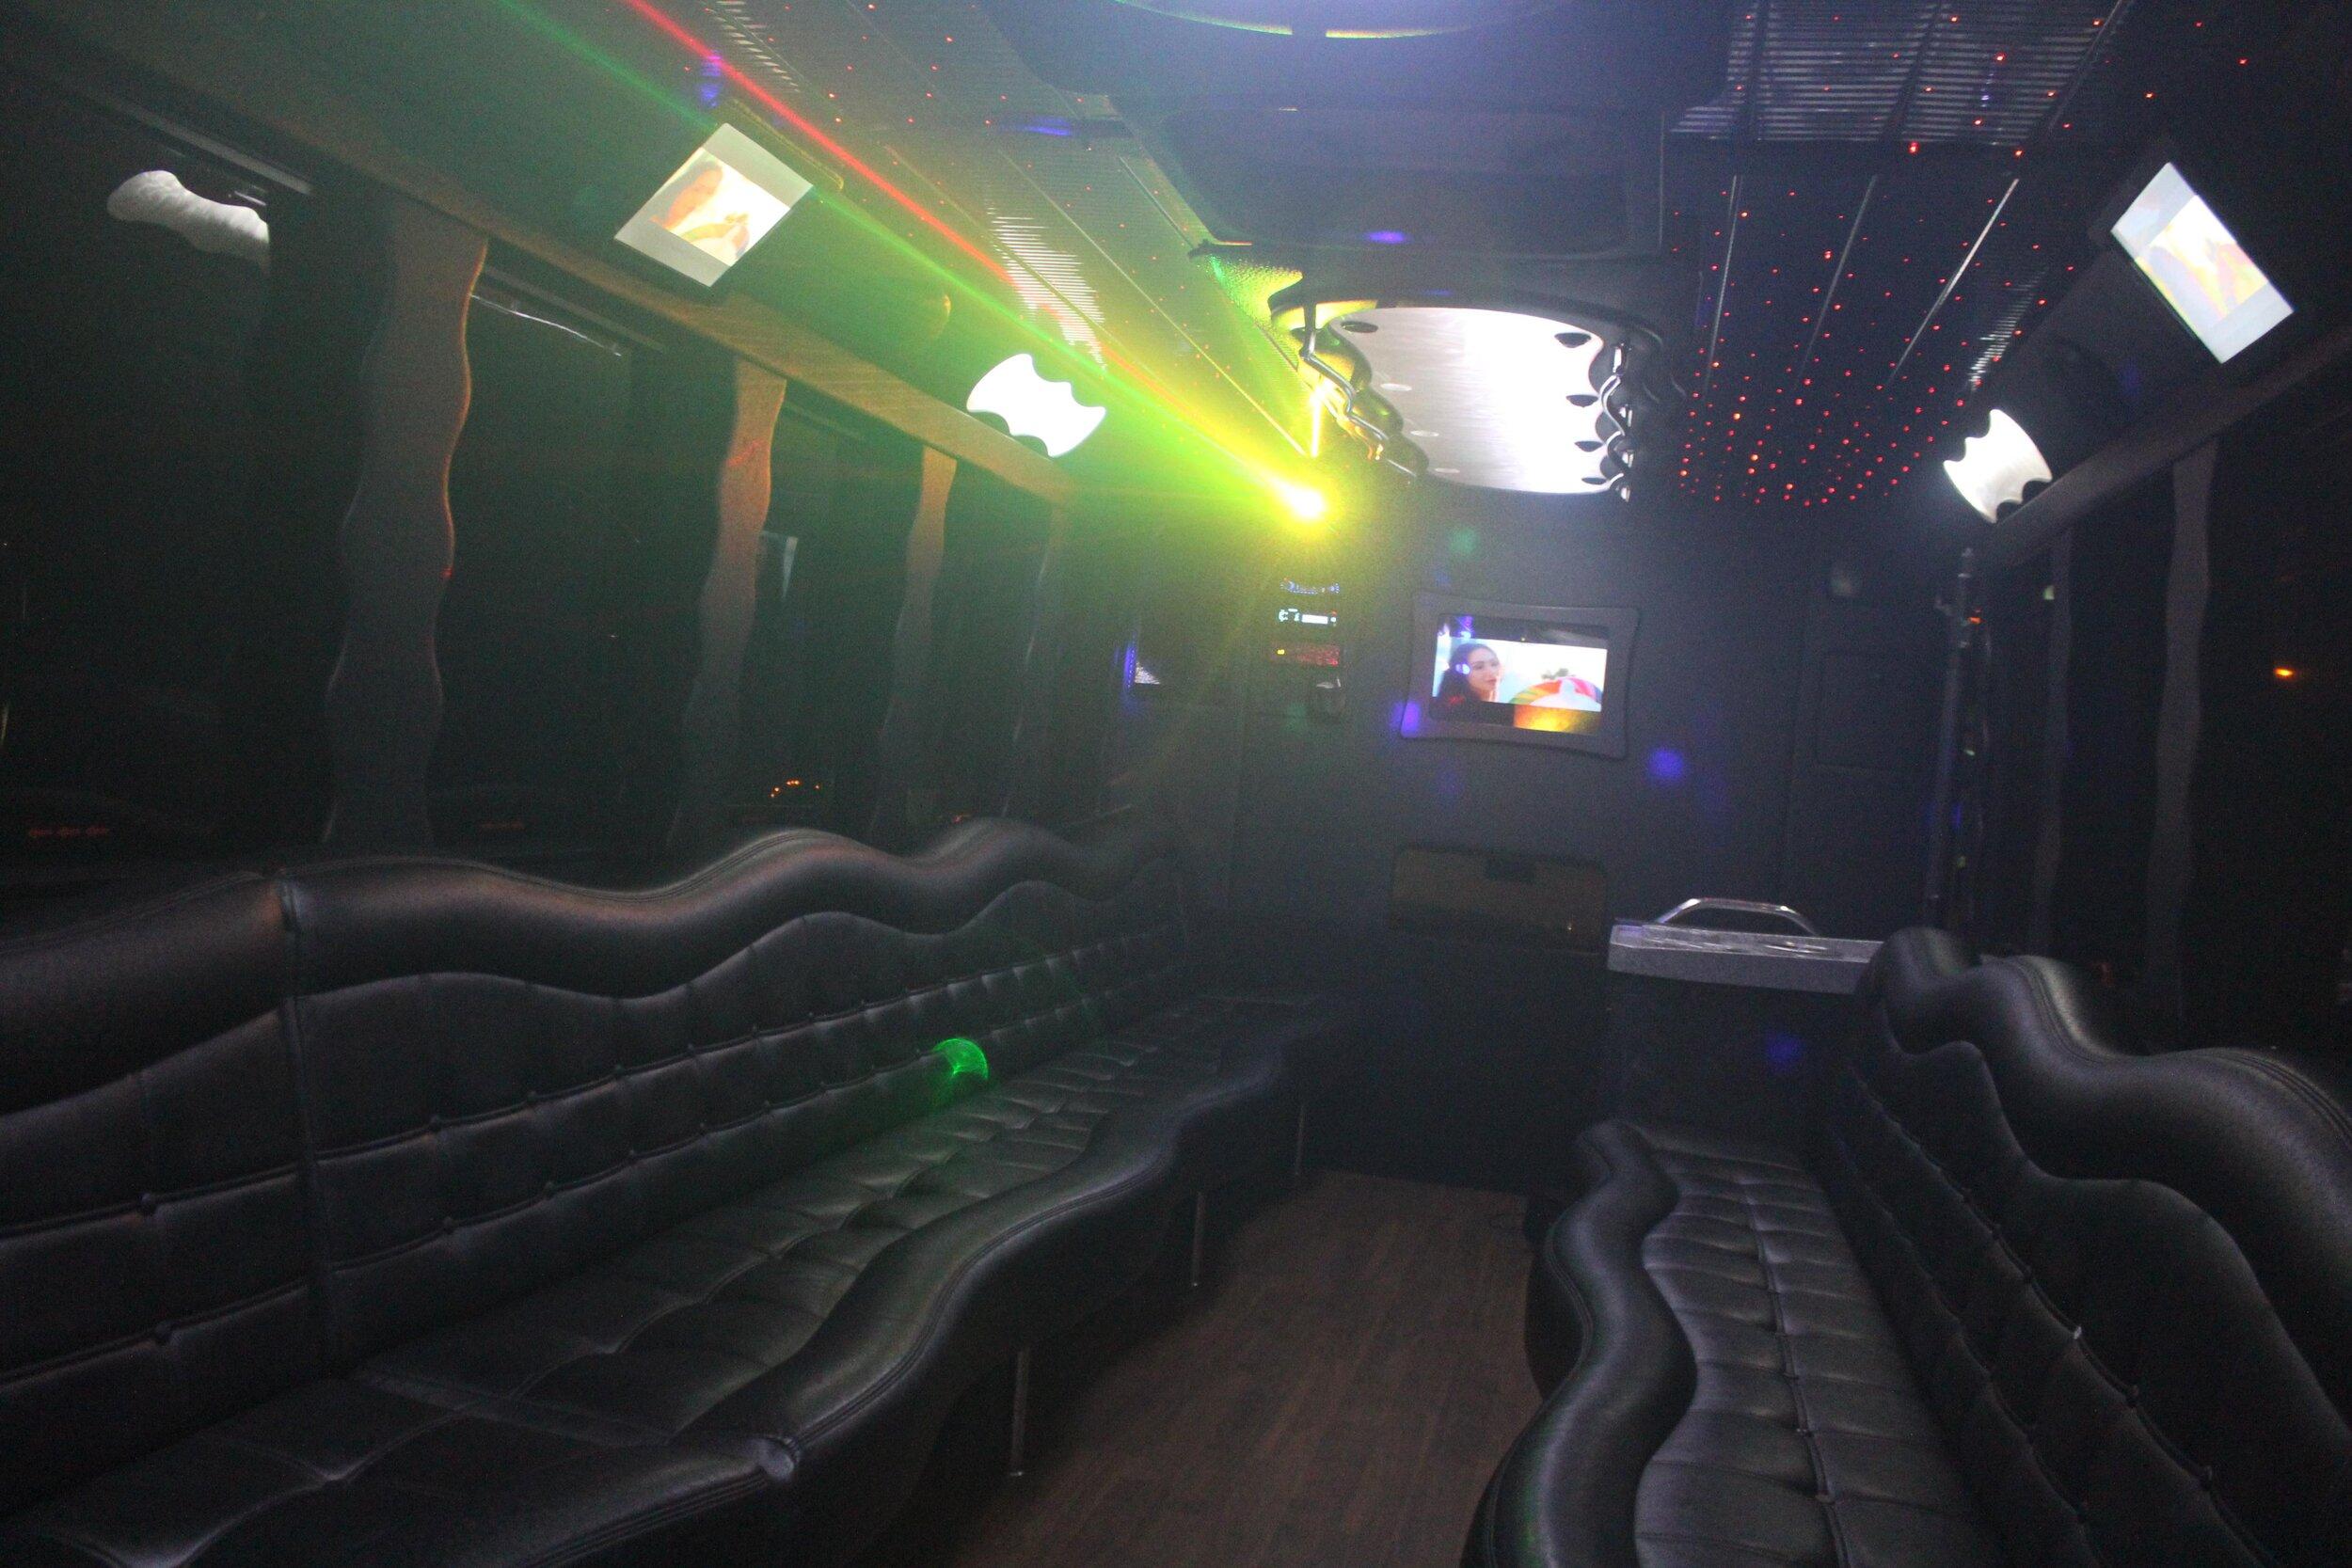 cheap-black-pearl-limo-bus-near-pacific-beach-interior-picture.jpg